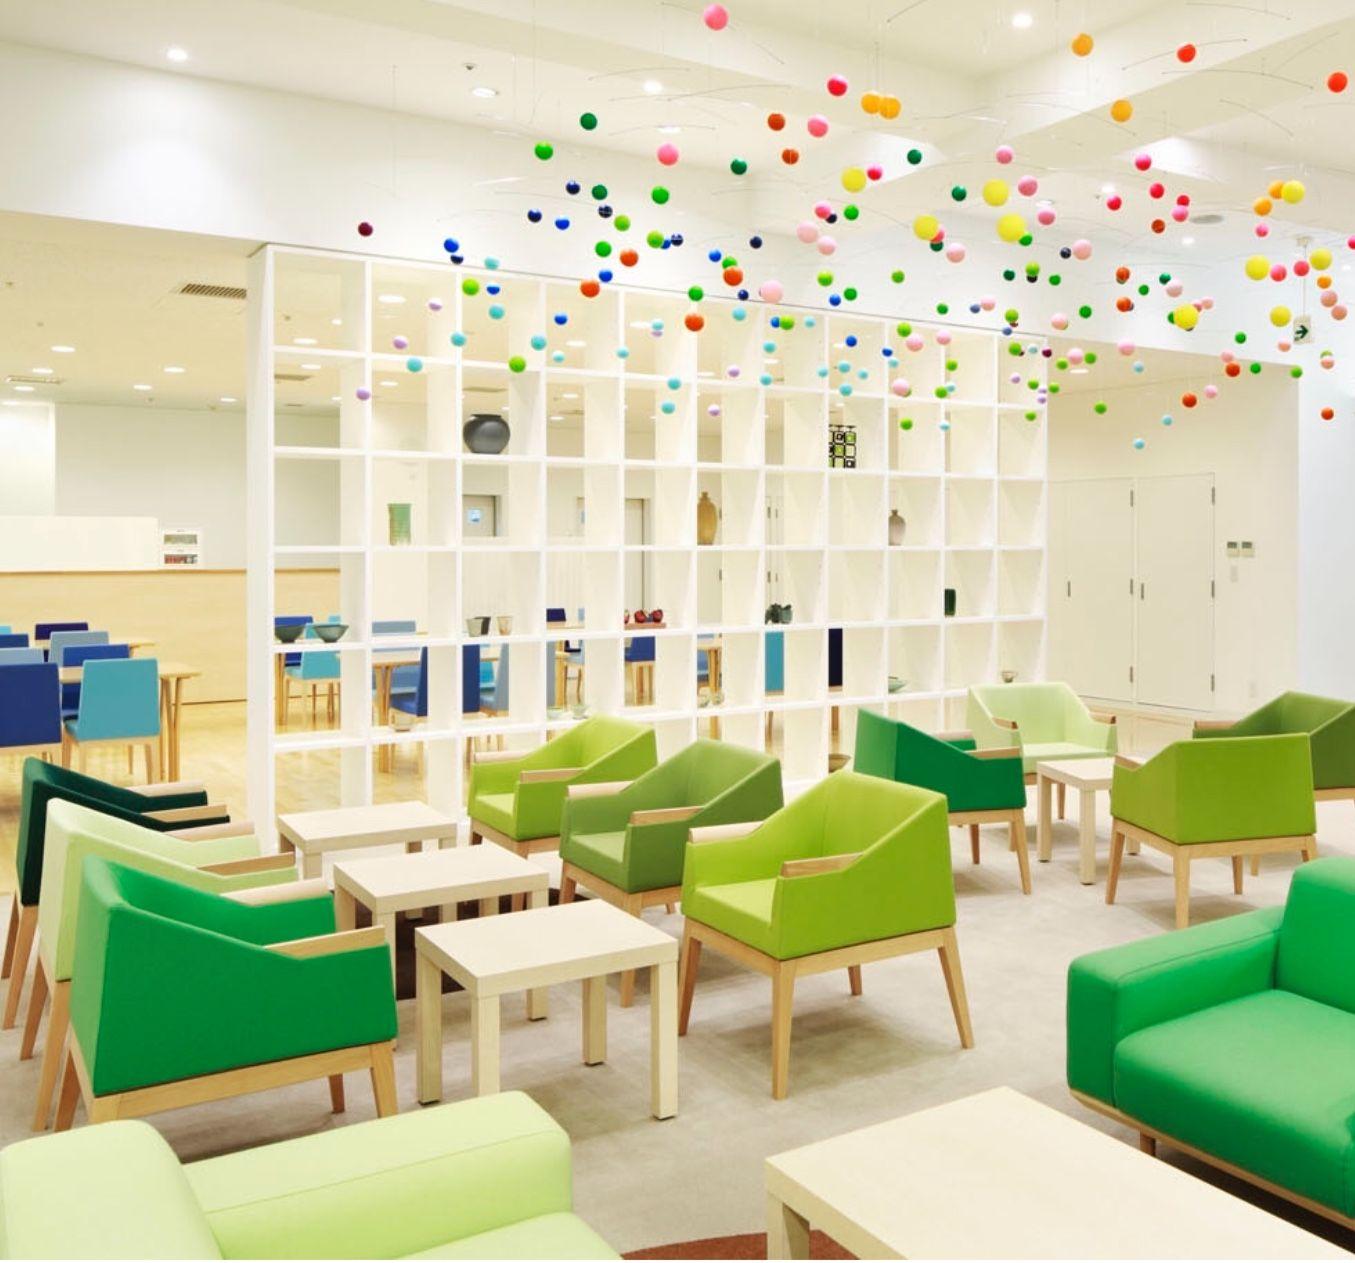 I Love The Design Of This Nursing Home The Lounge Area Of Shinjuen Nursing Home In Kawagoe Japan De Hospital Interior Design Hospital Design Hospital Interior